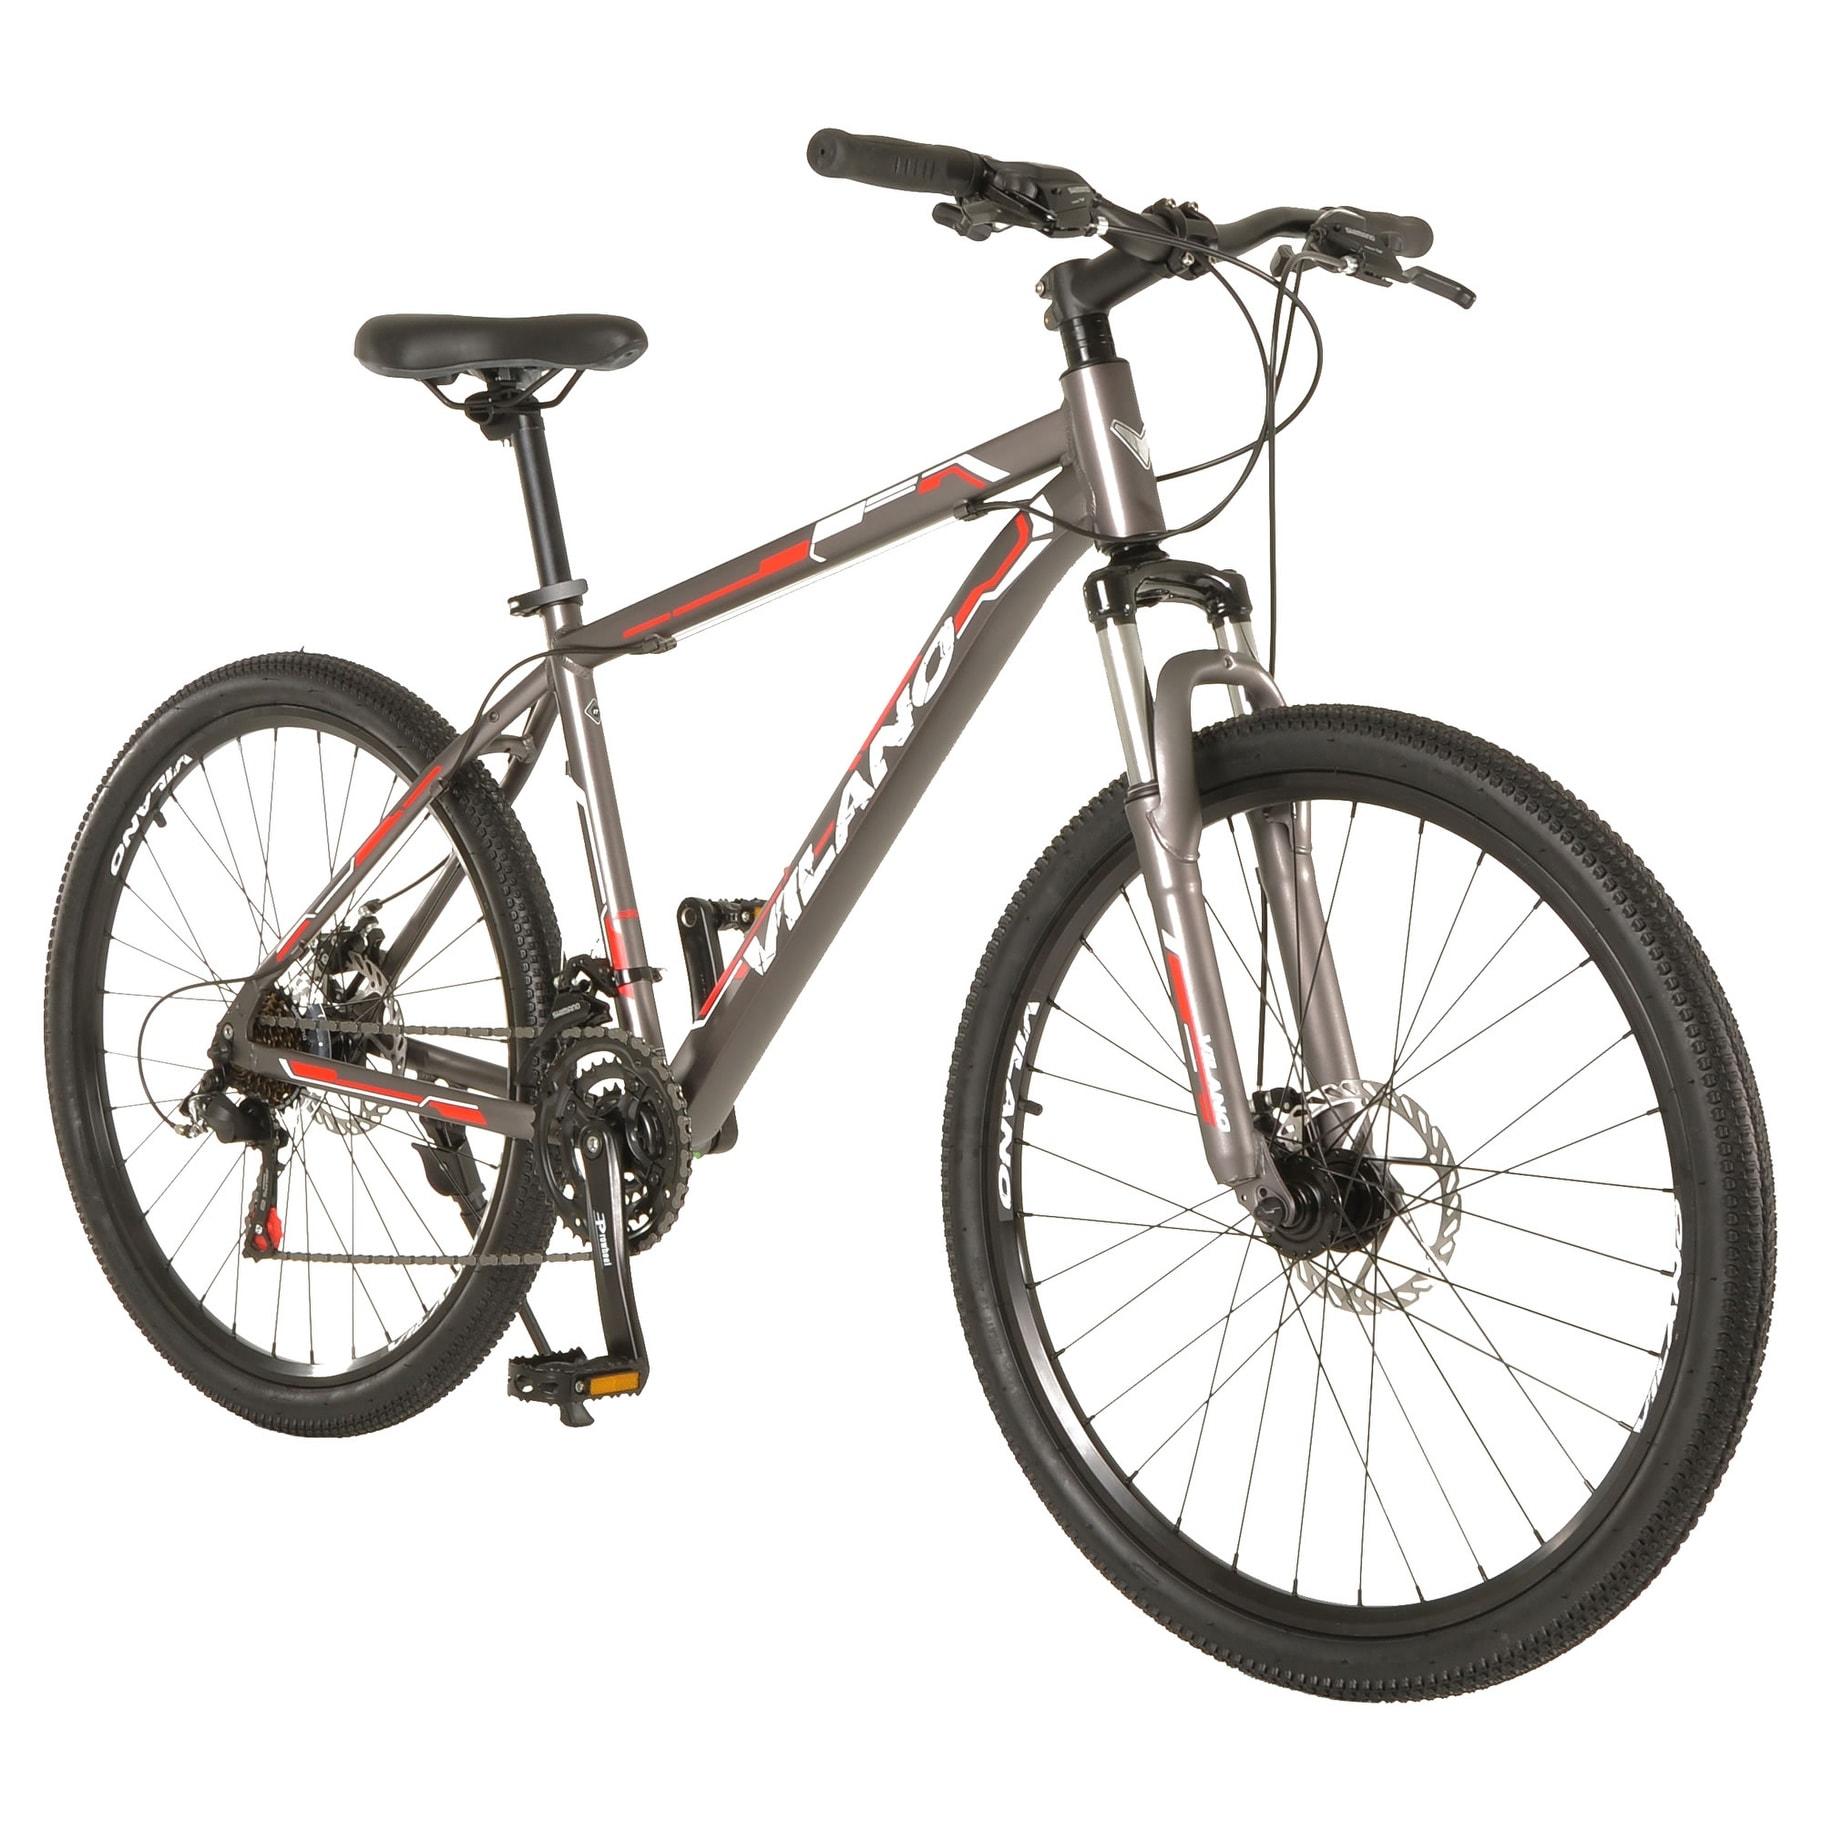 0fe11b42b Shop Vilano Ridge 1.0 Mountain Bike MTB 21 Speed with Disc Brakes - Free  Shipping Today - Overstock - 18072083